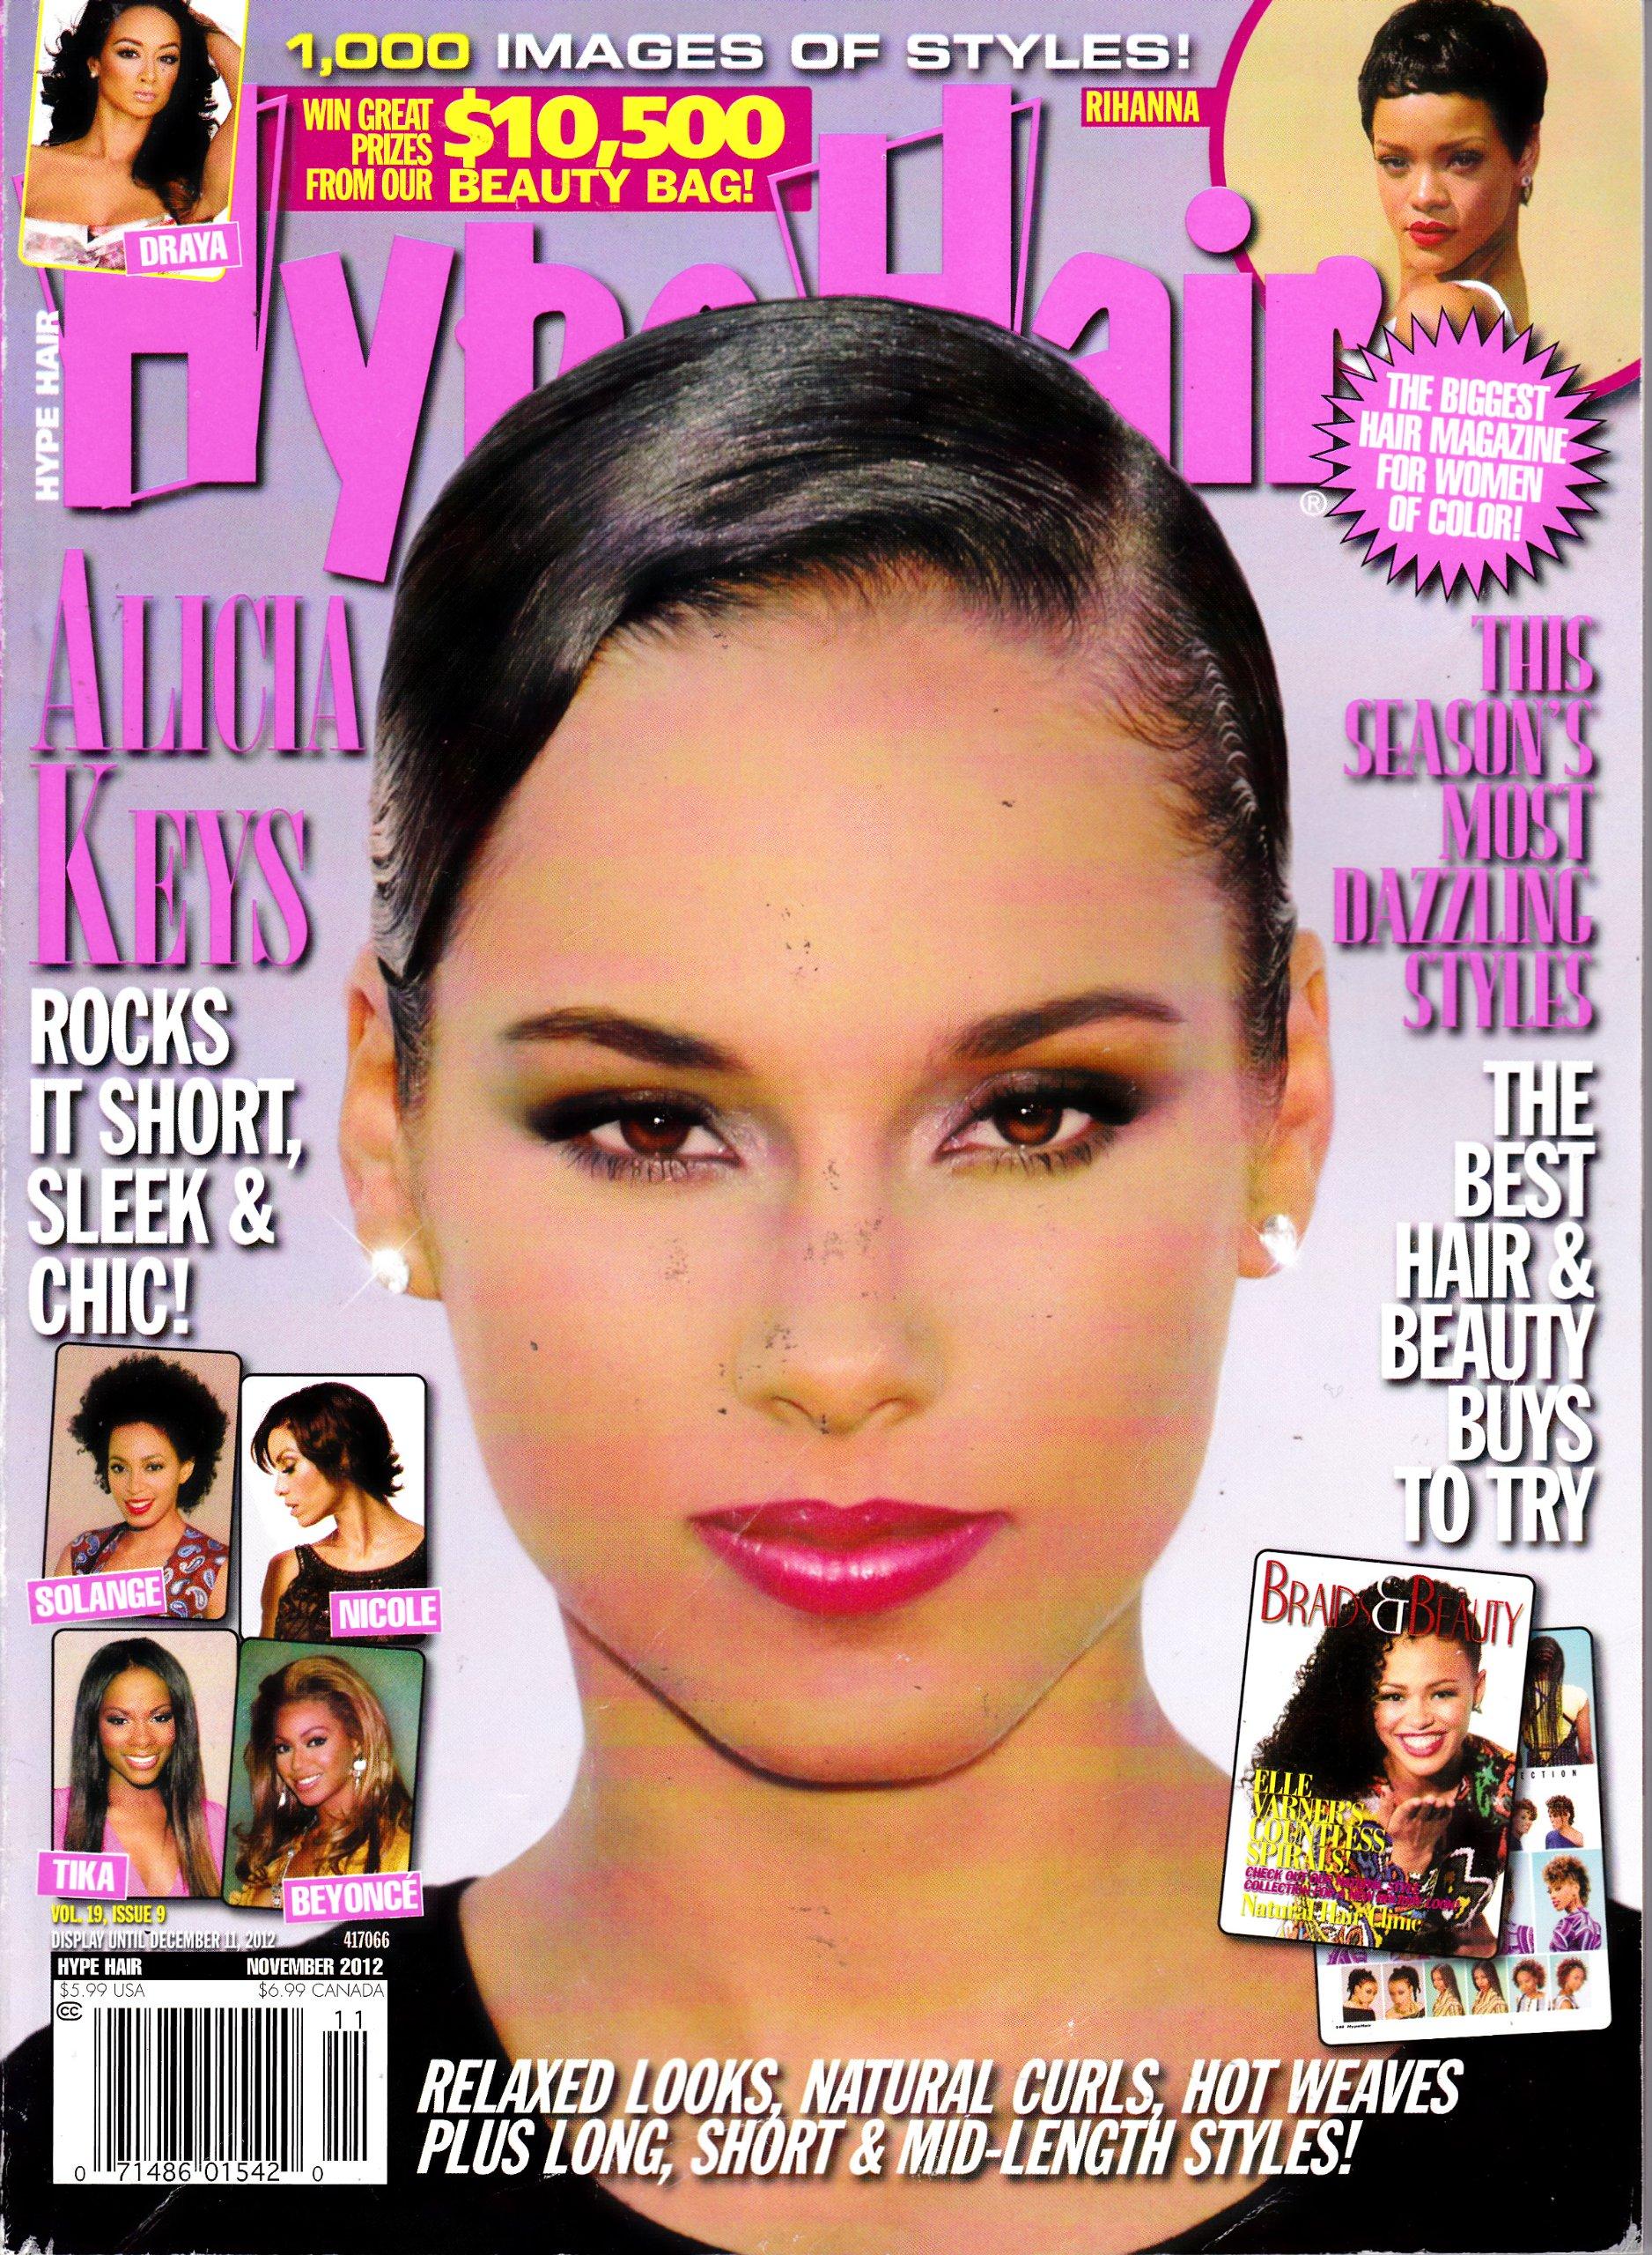 HYPE HAIR MAGAZINE NOVEMBER 2012 *ALICIA KEYS*: Various ...